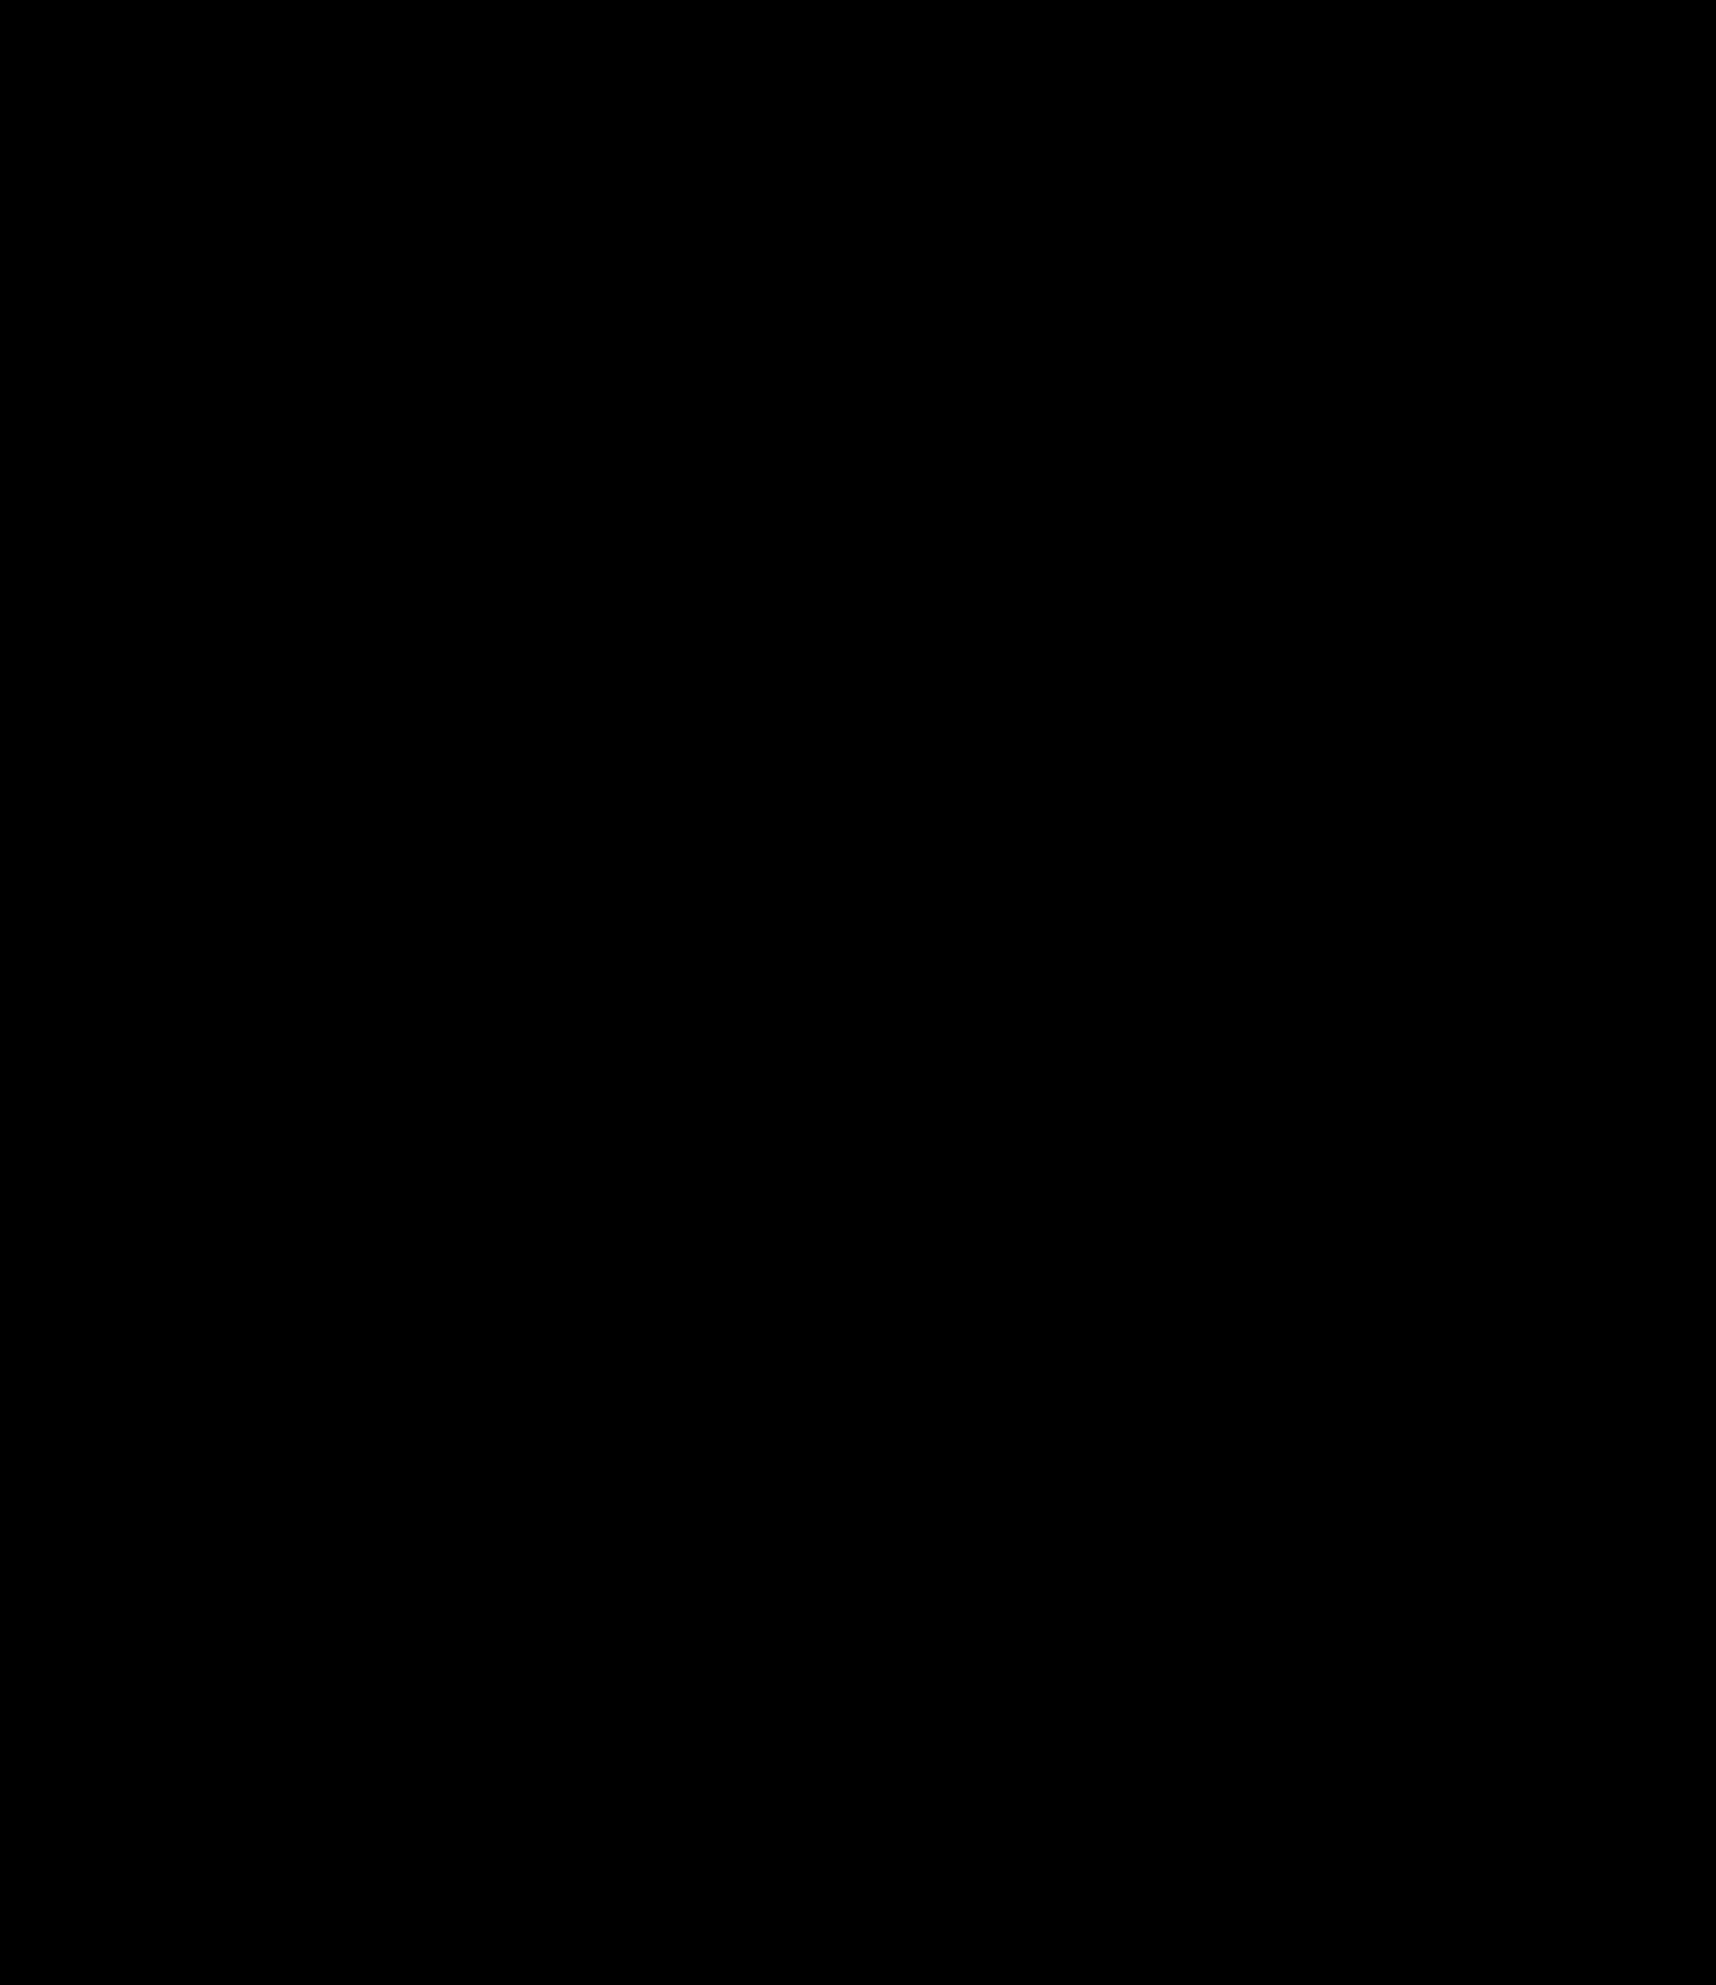 FP_logo%20czarne%20prze%C5%BArocze.png